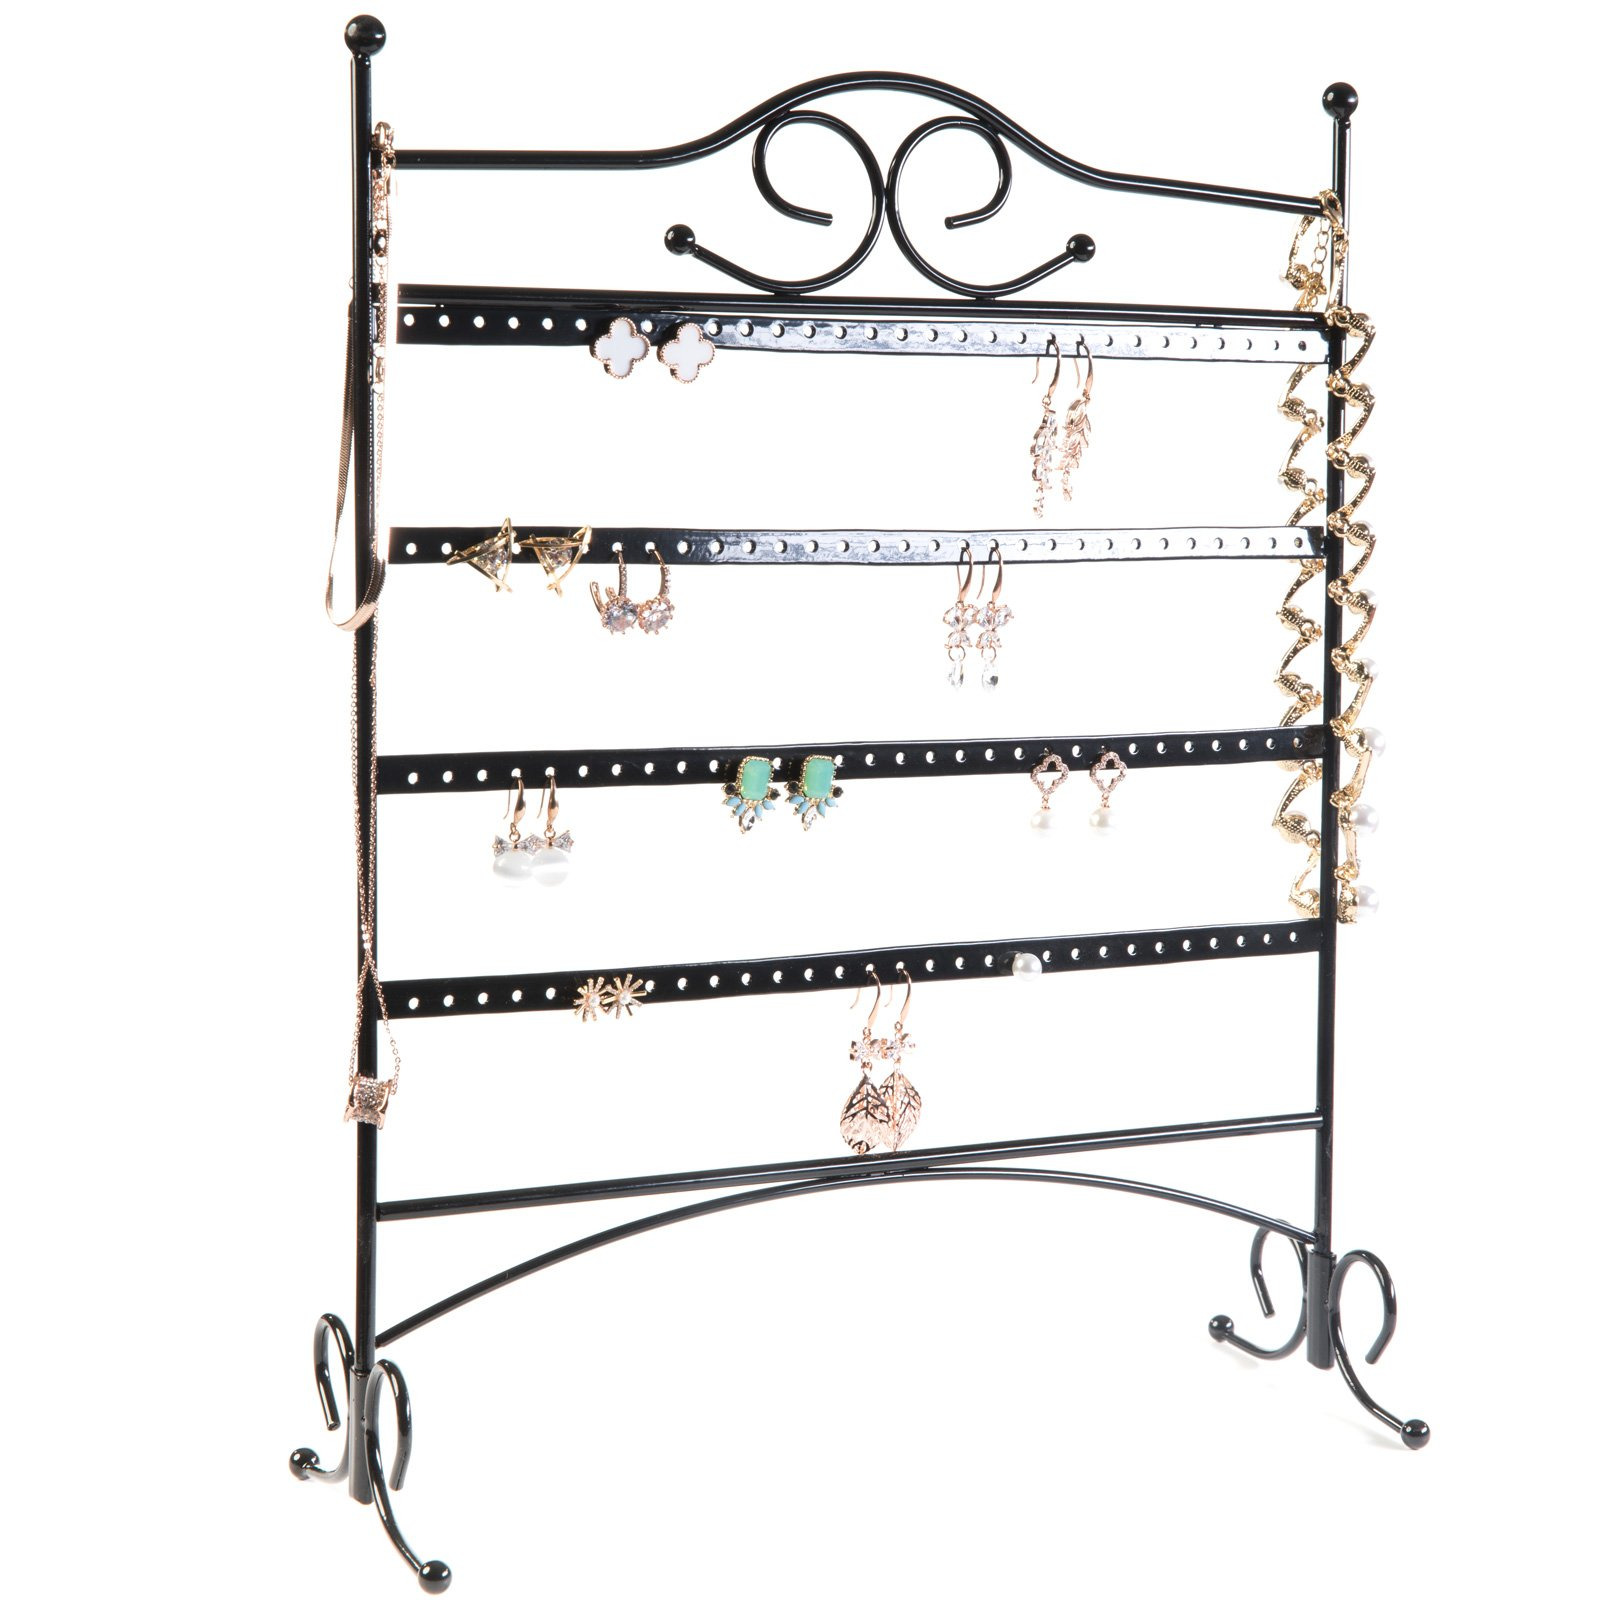 HUJI Black Jewelry Organizer Rack Earring Holder Necklace Bracelet Stand Display Storage (1, Steel Earrings Holder)